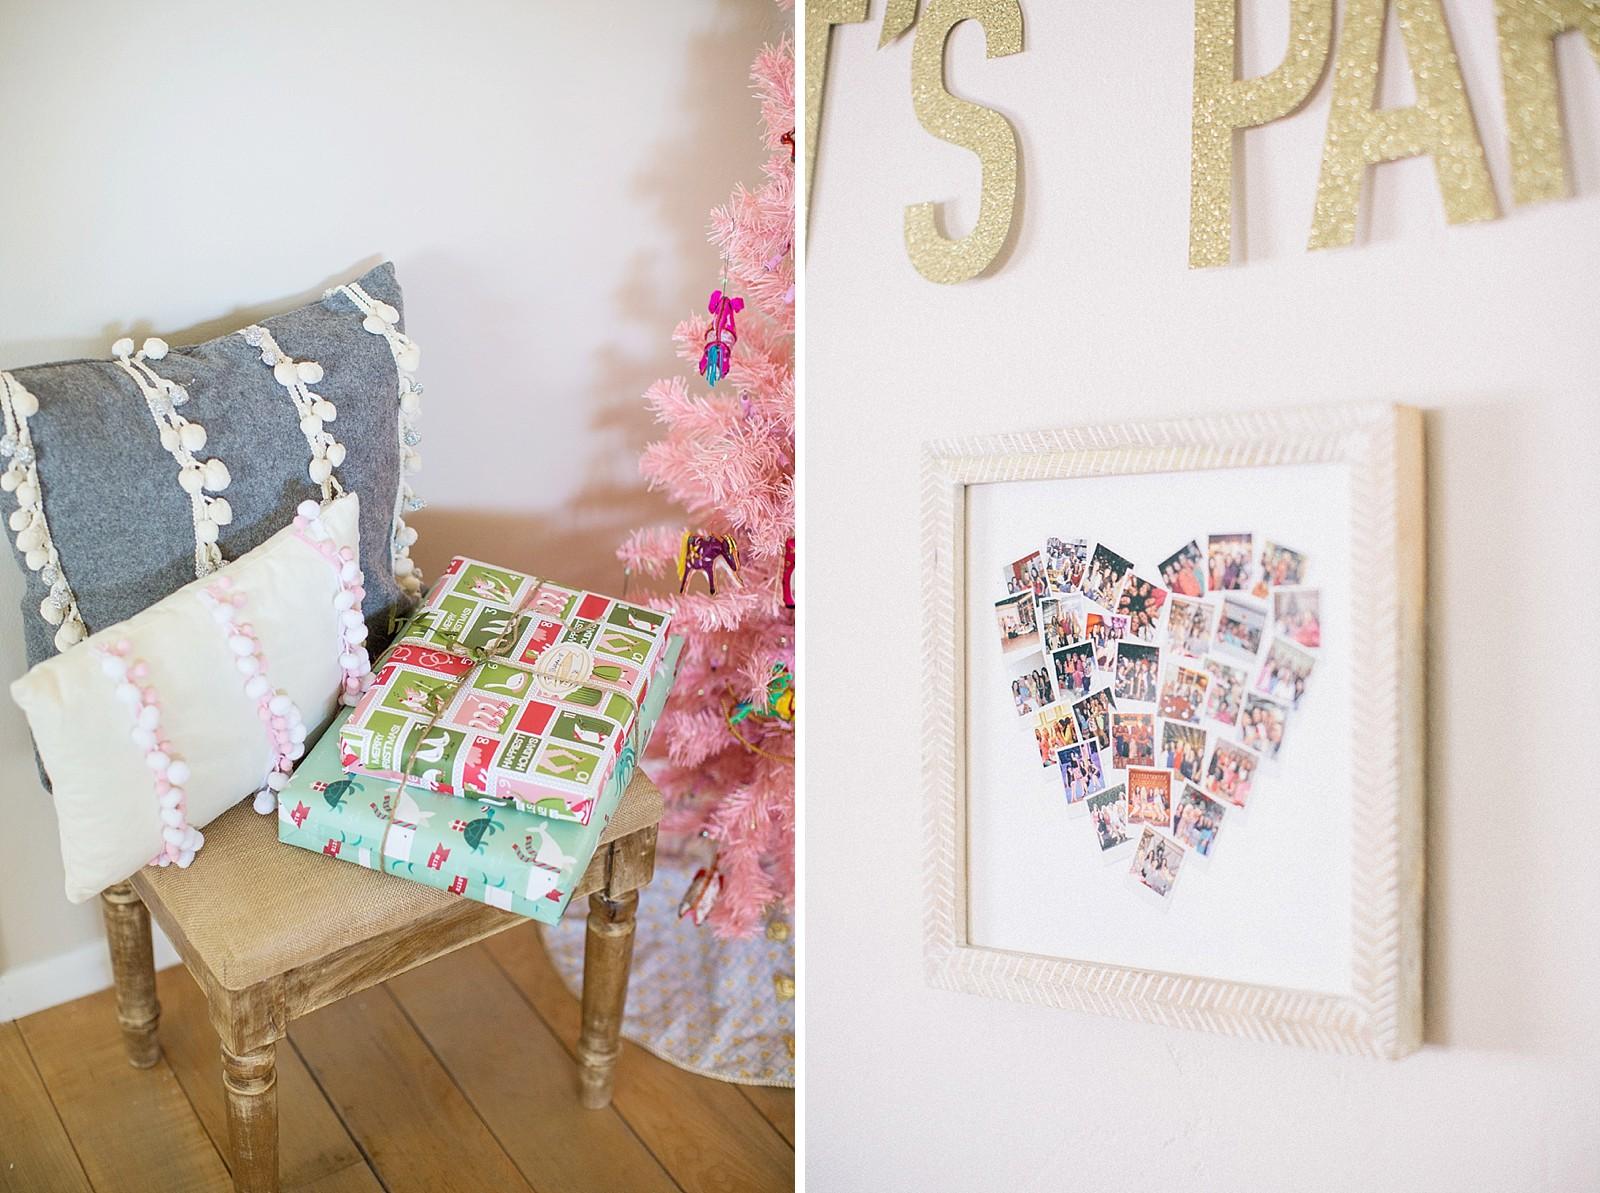 minted-christmas-inspiration-girls-party-photos-diana-elizabeth-blog-lifestyle-hostess-entertainment-home-blog-2316